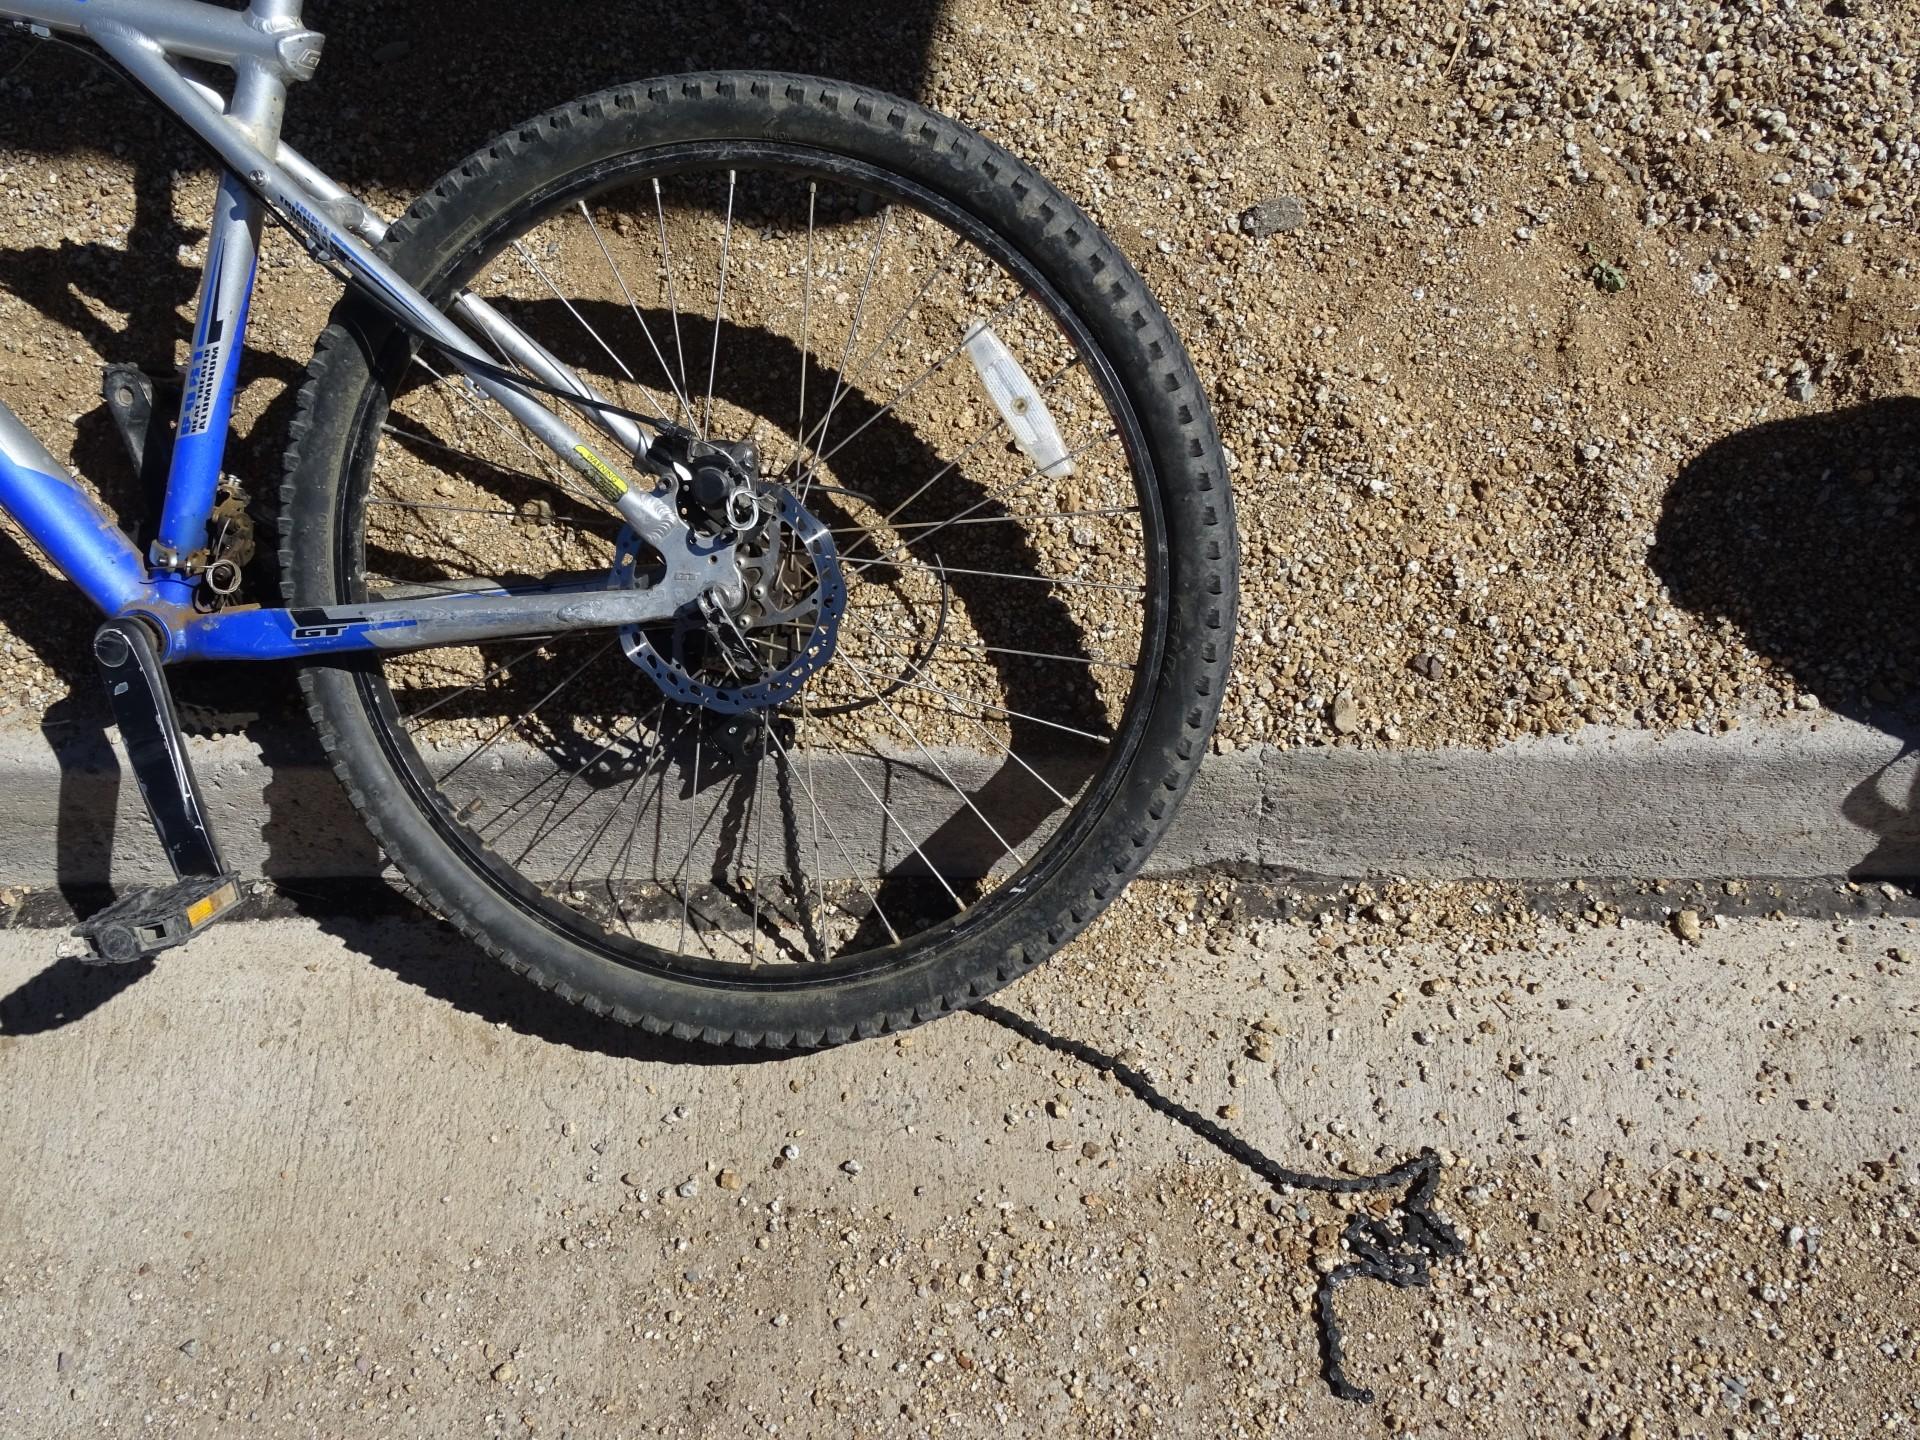 A broken bike.